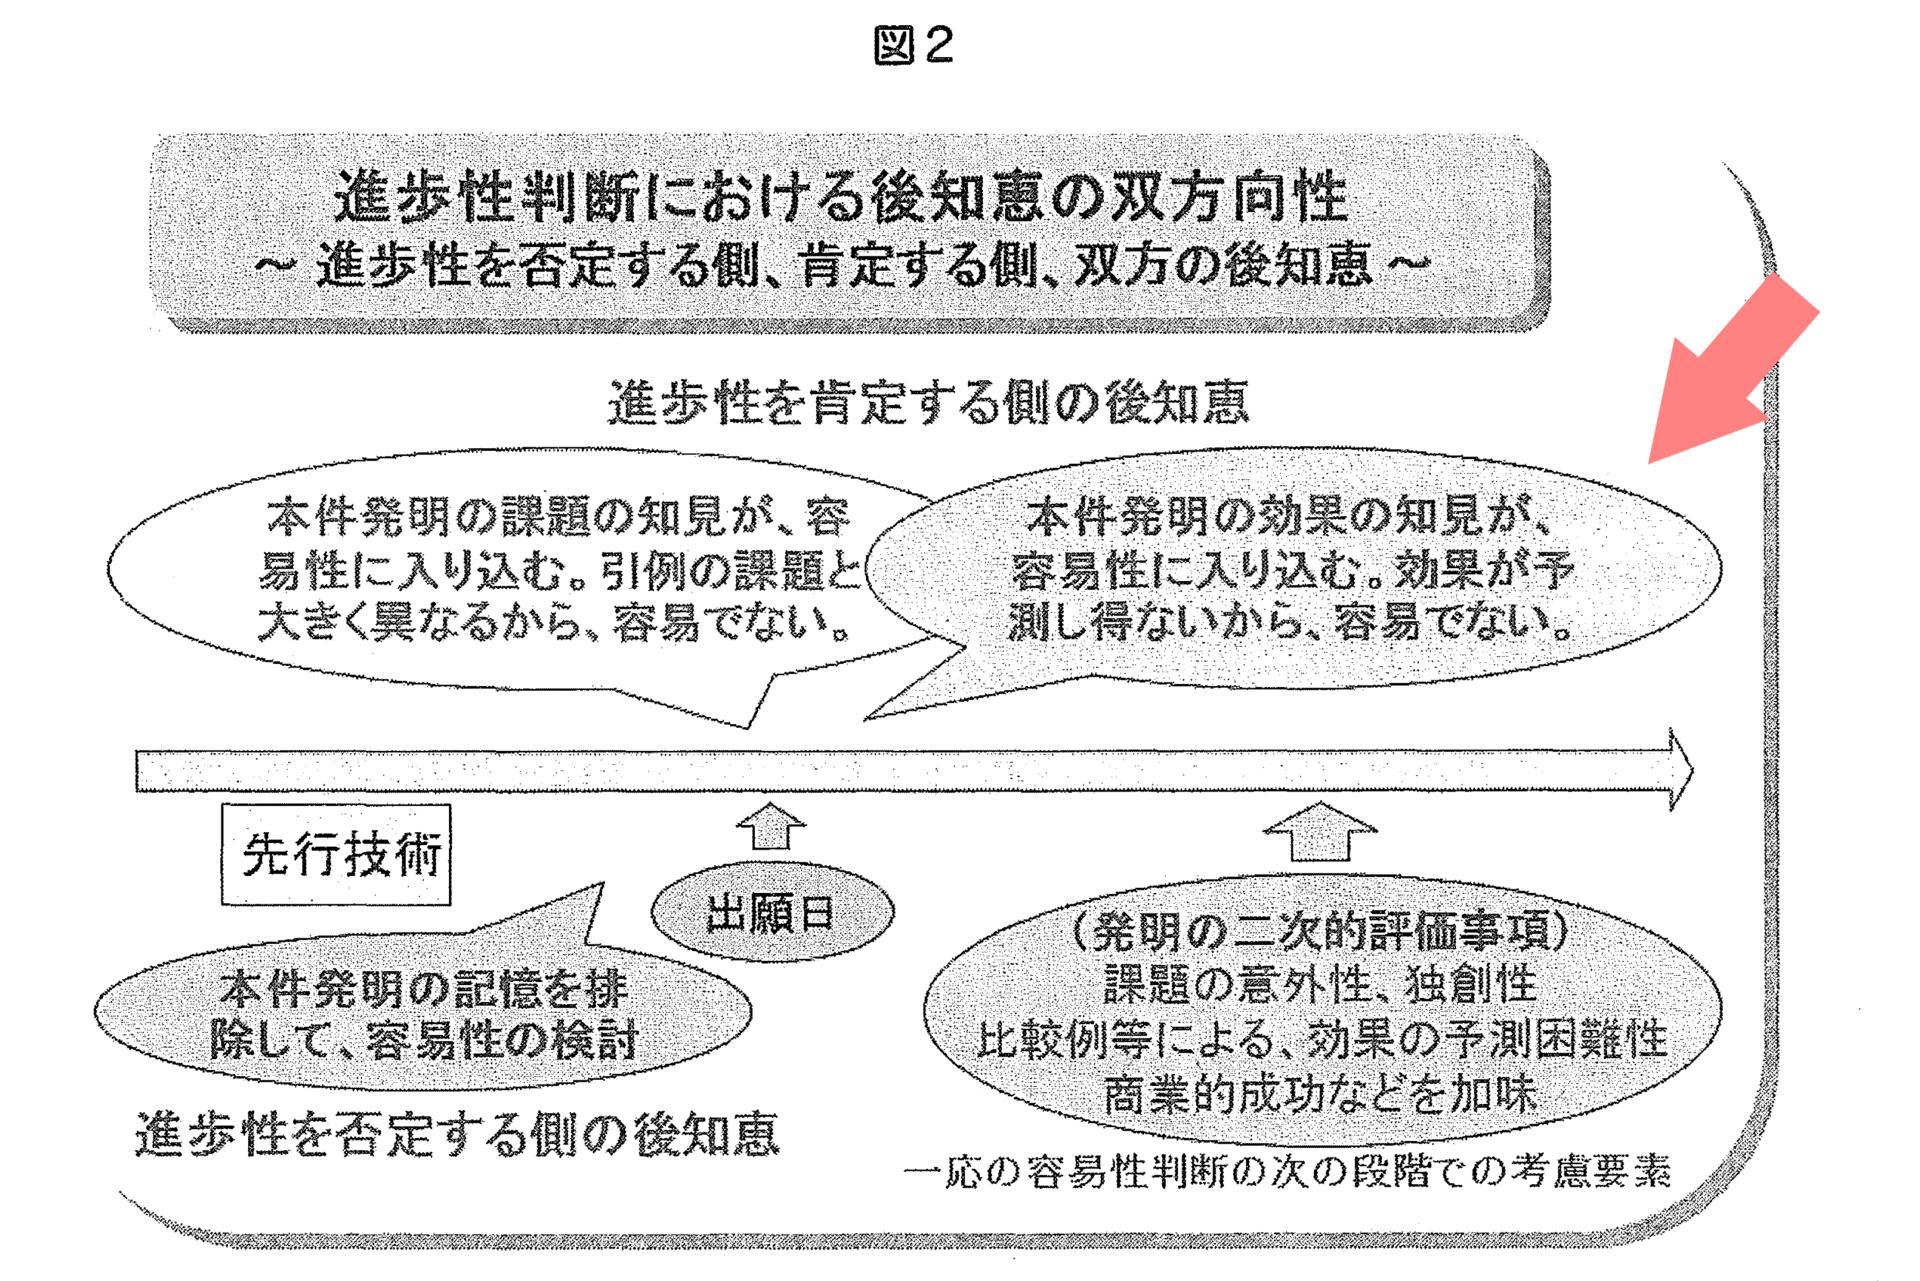 Miyazaki_ChizaiP_2020-v18n213_fig2.png